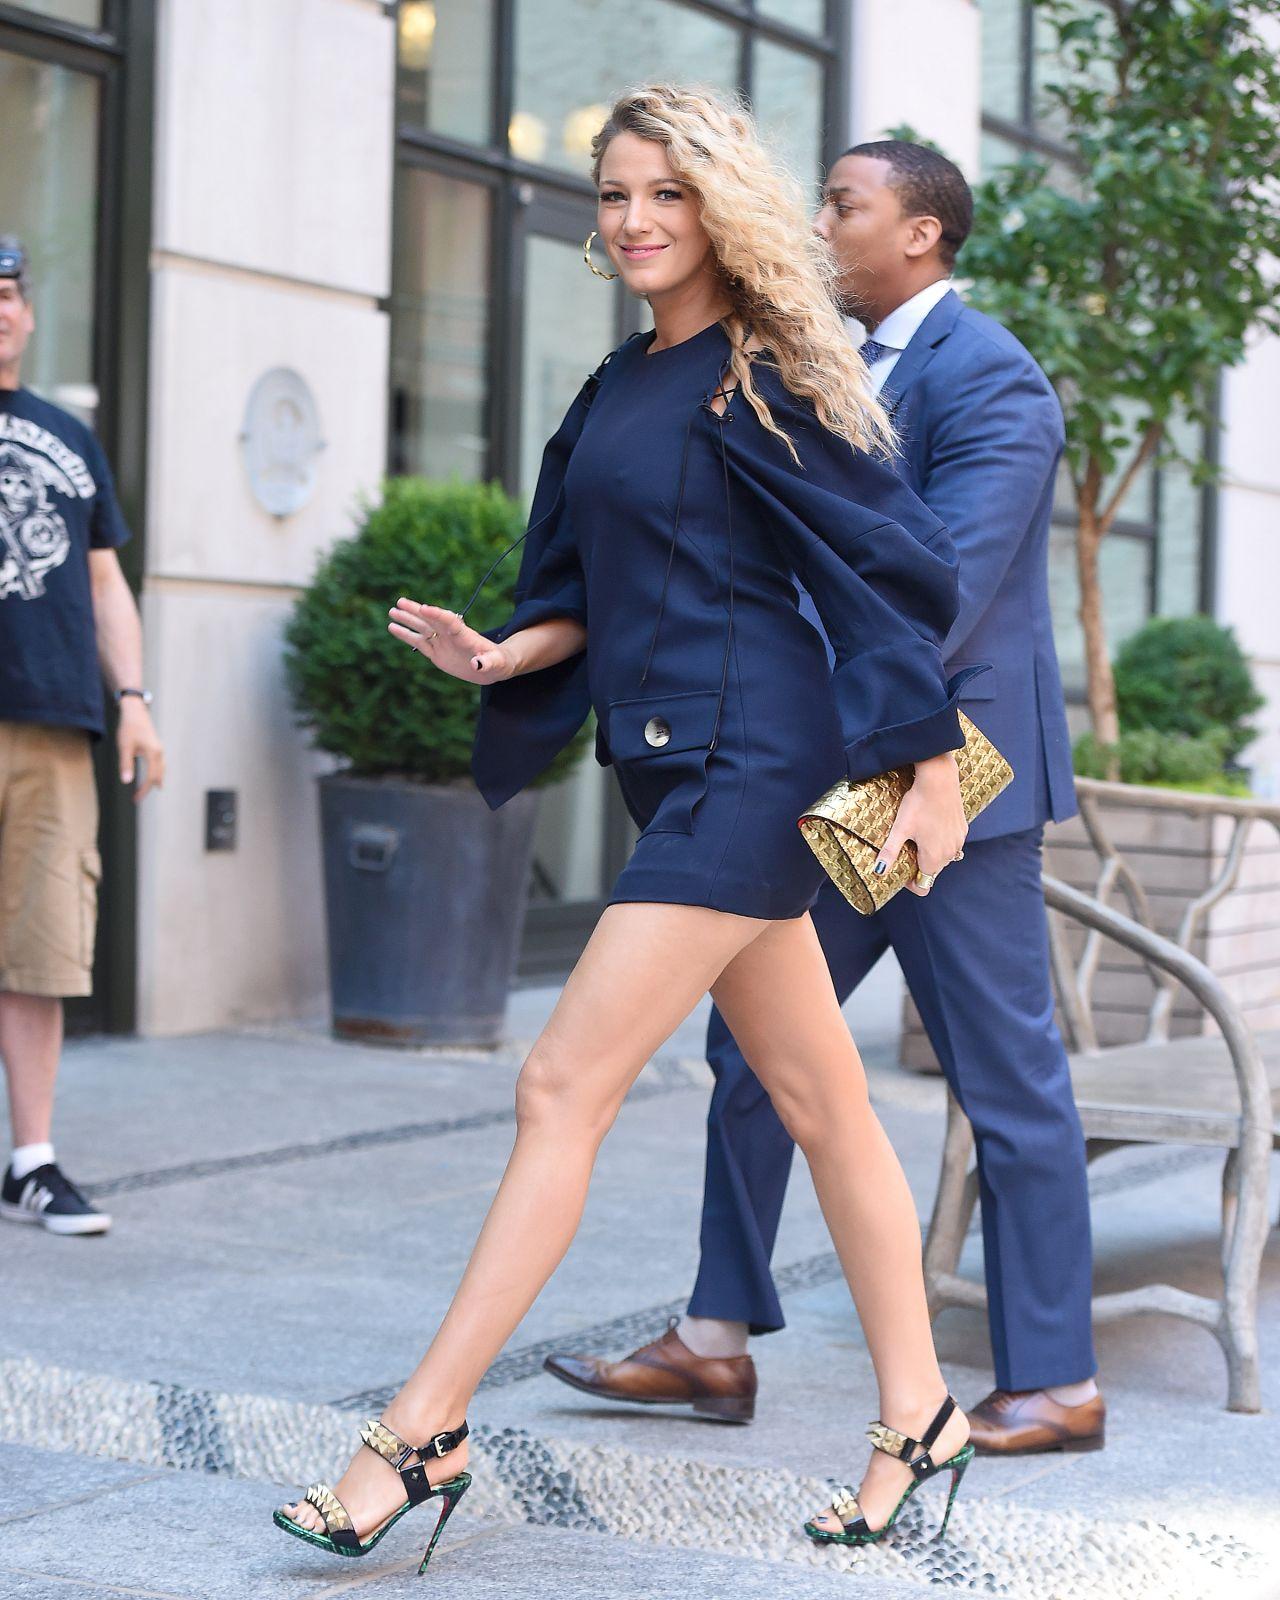 Blake Lively Chic Street Style - New York City 6/22/2016